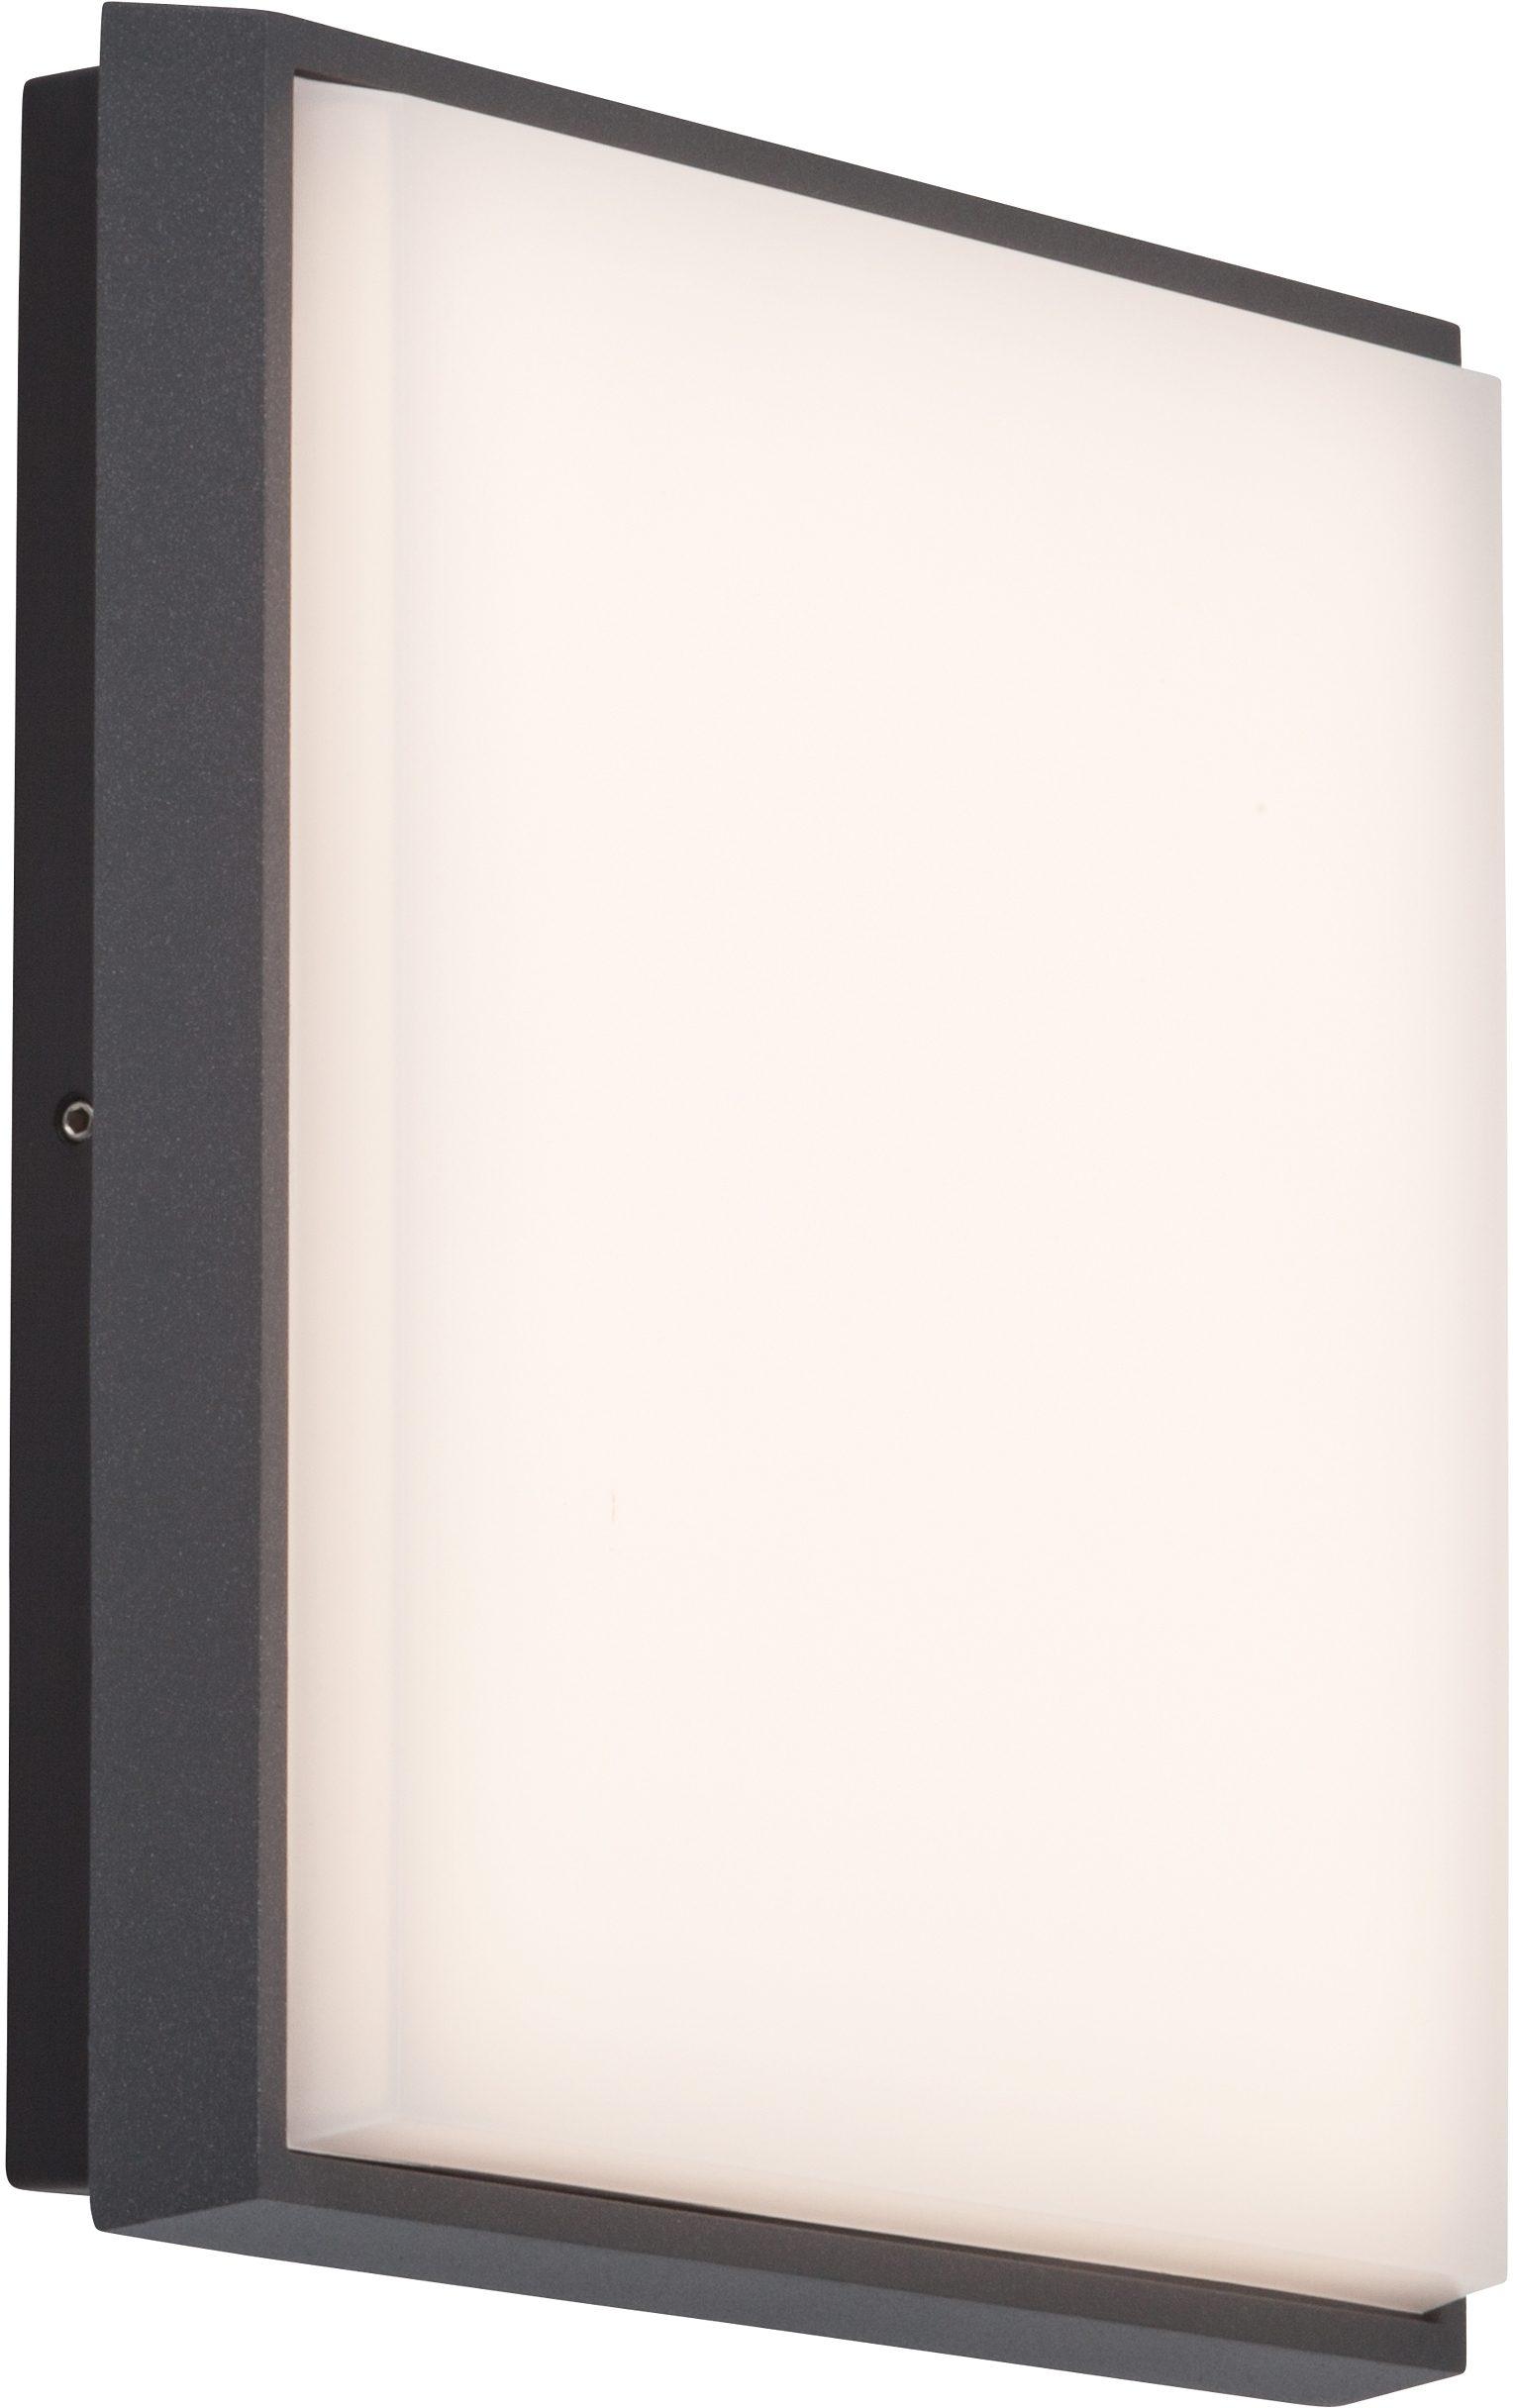 AEG LED Außenleuchte, 1flg., Wand-/Deckenleuchte, »LETAN SQUARE«